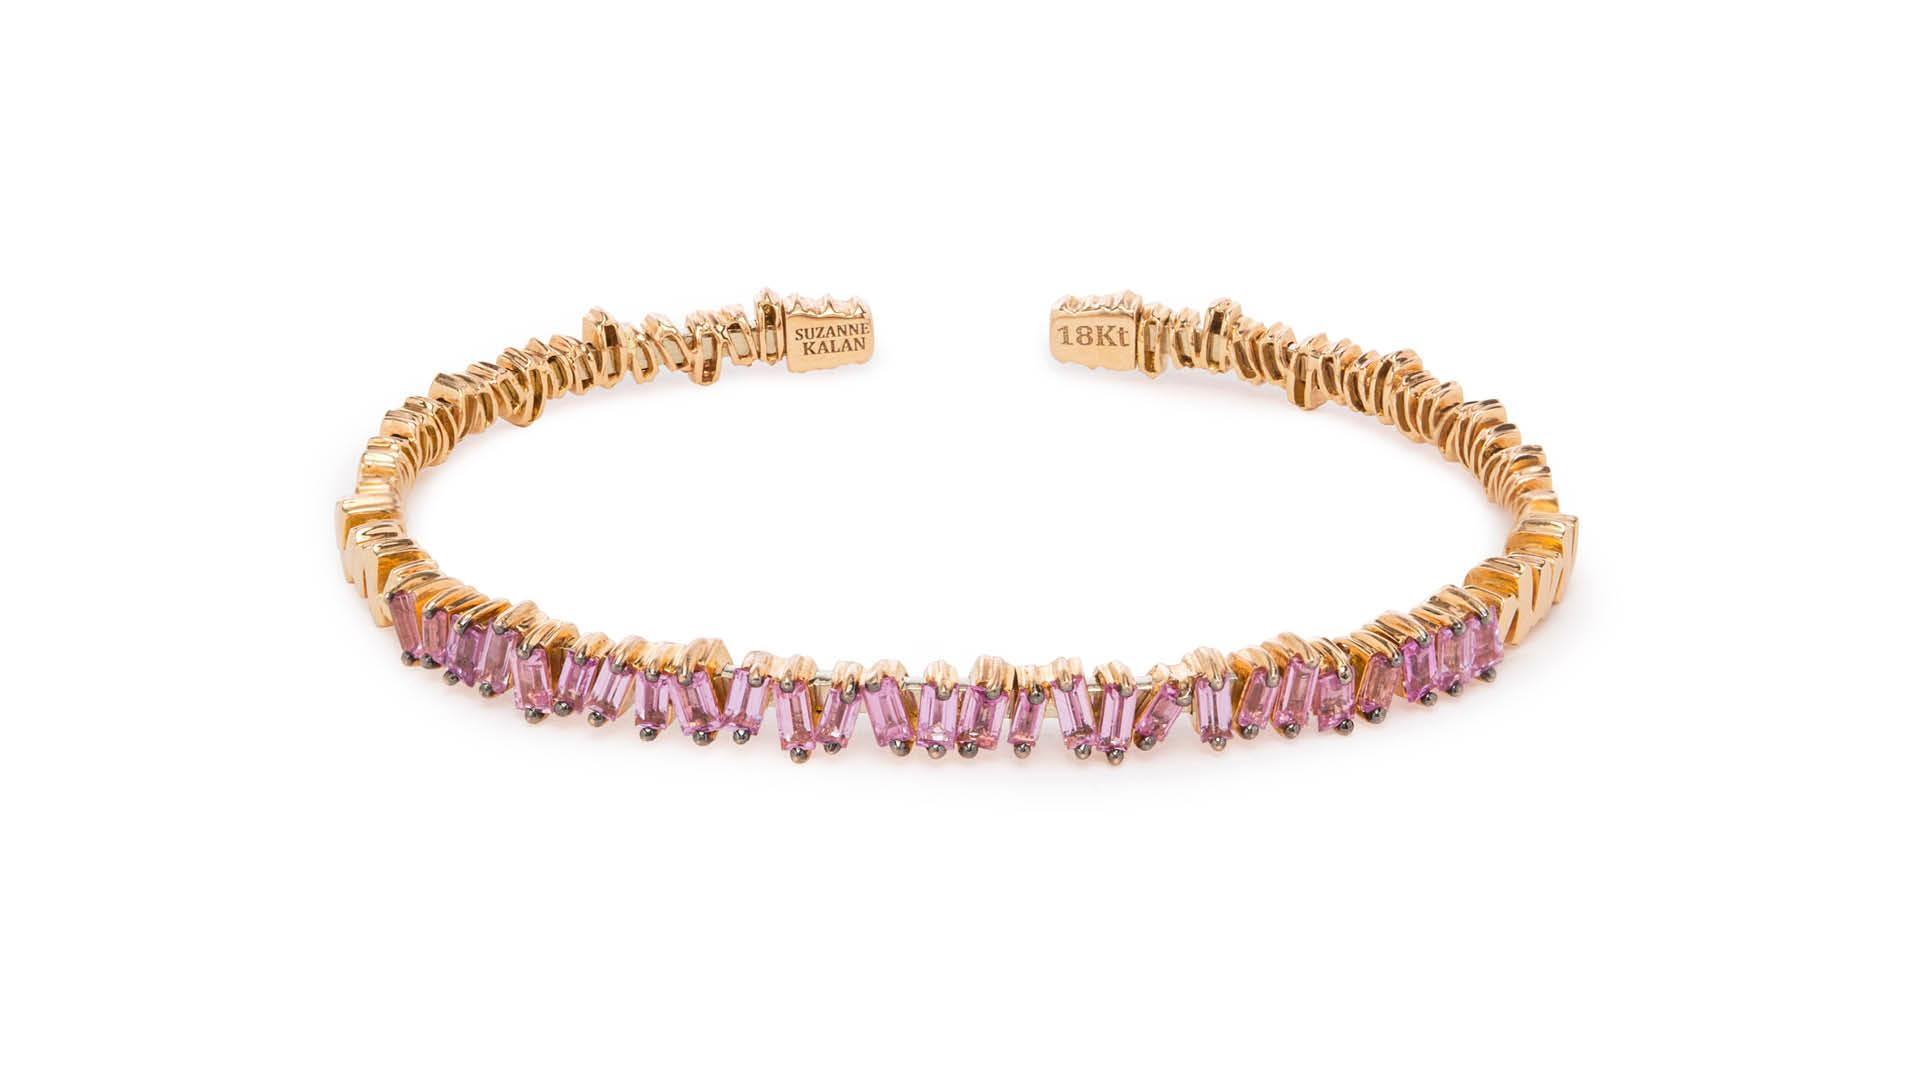 Suzanne-Kalan-Pink-Sapphire-Fireworks-Bracelet